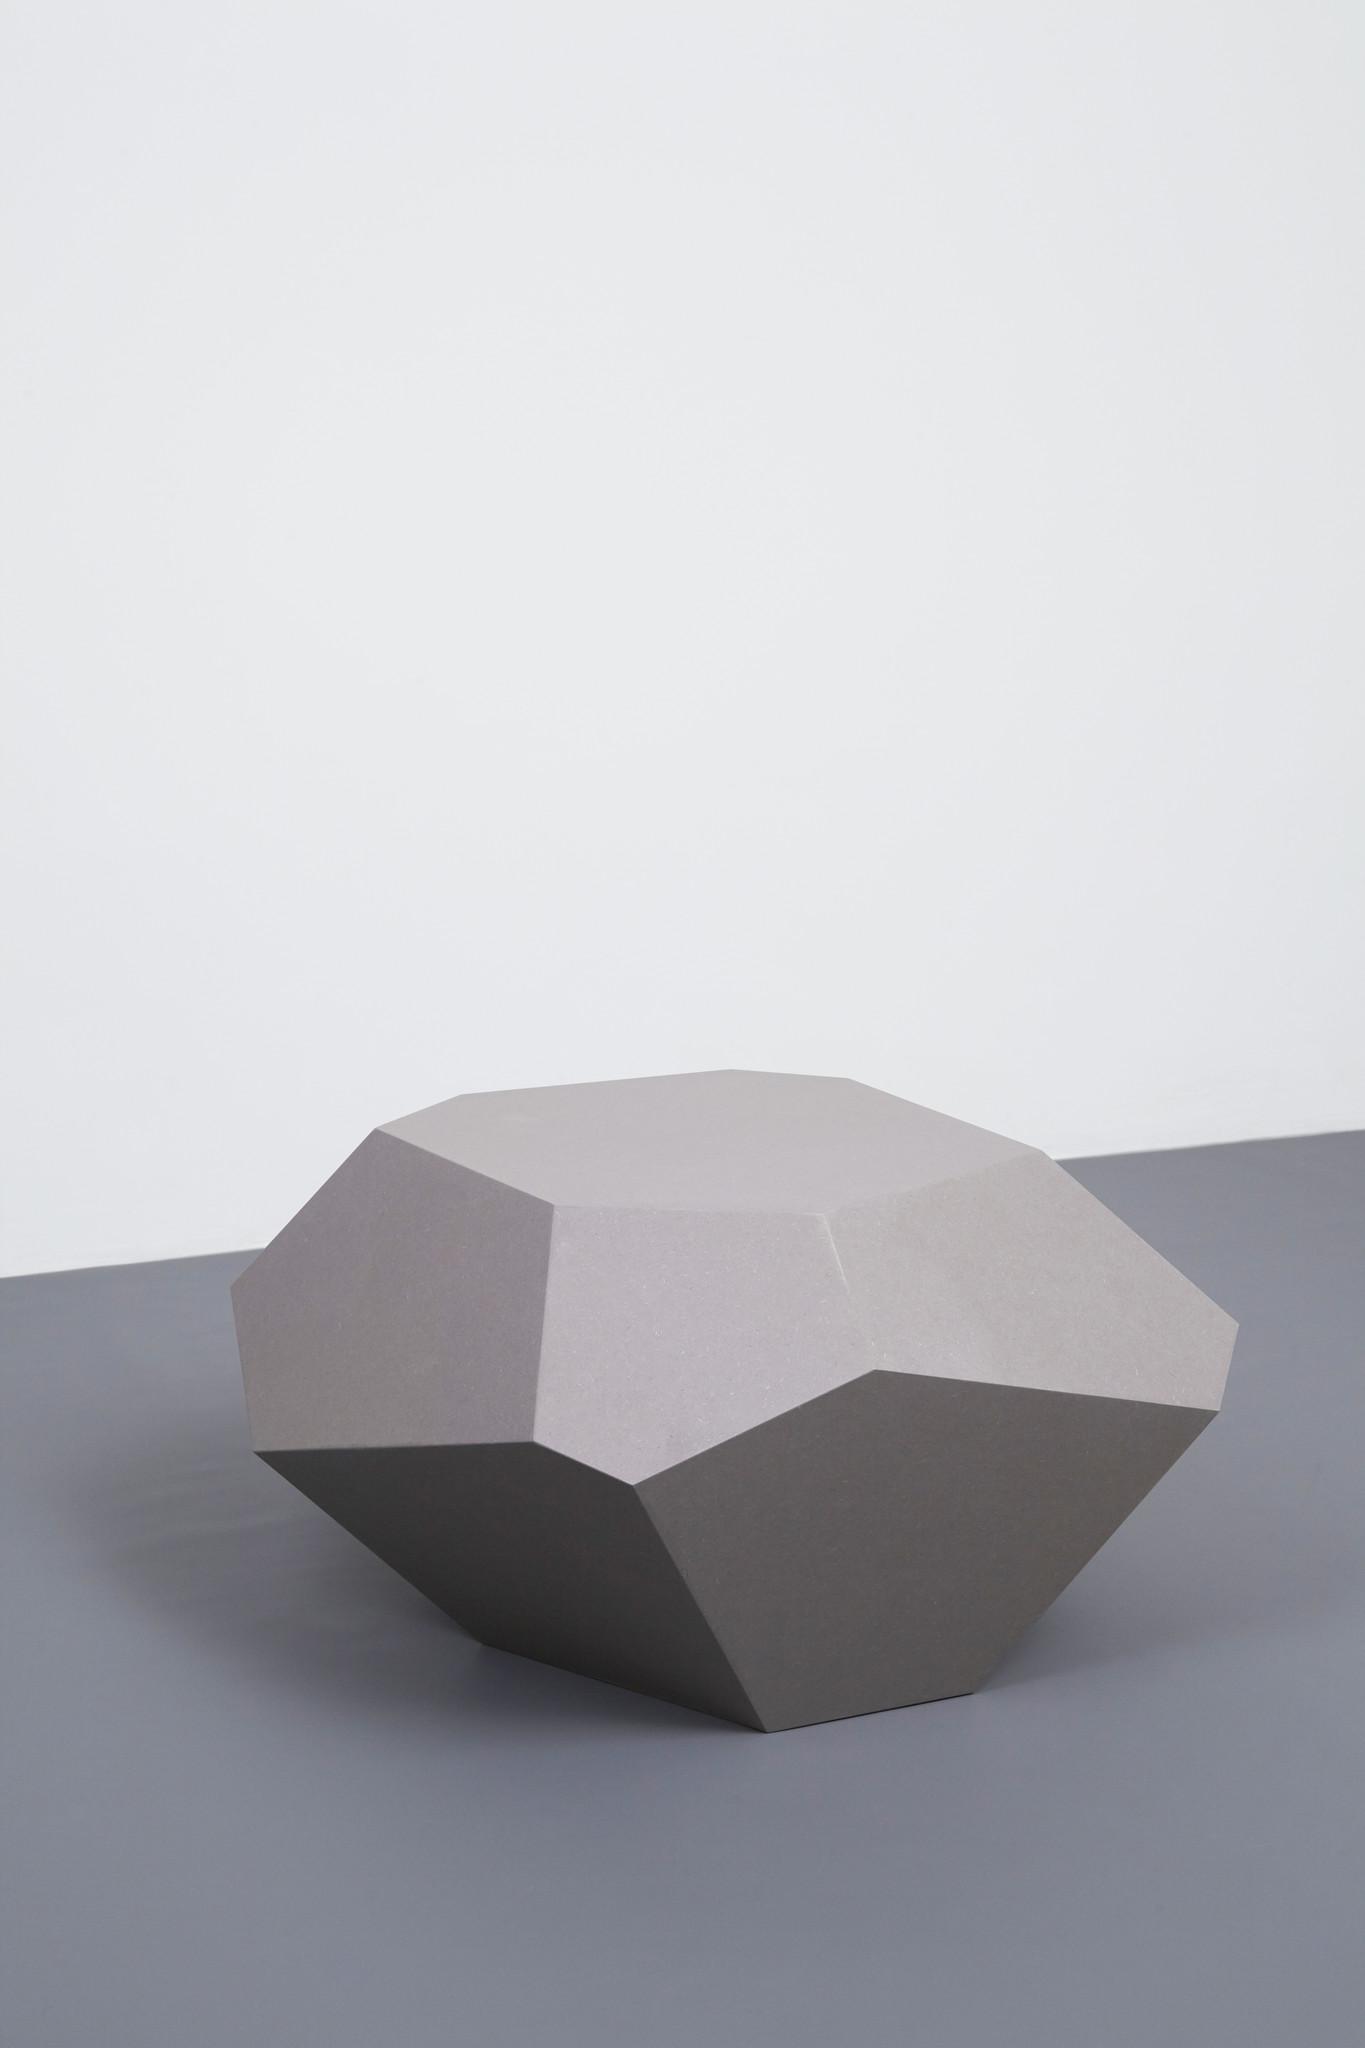 Mineralism sculpture